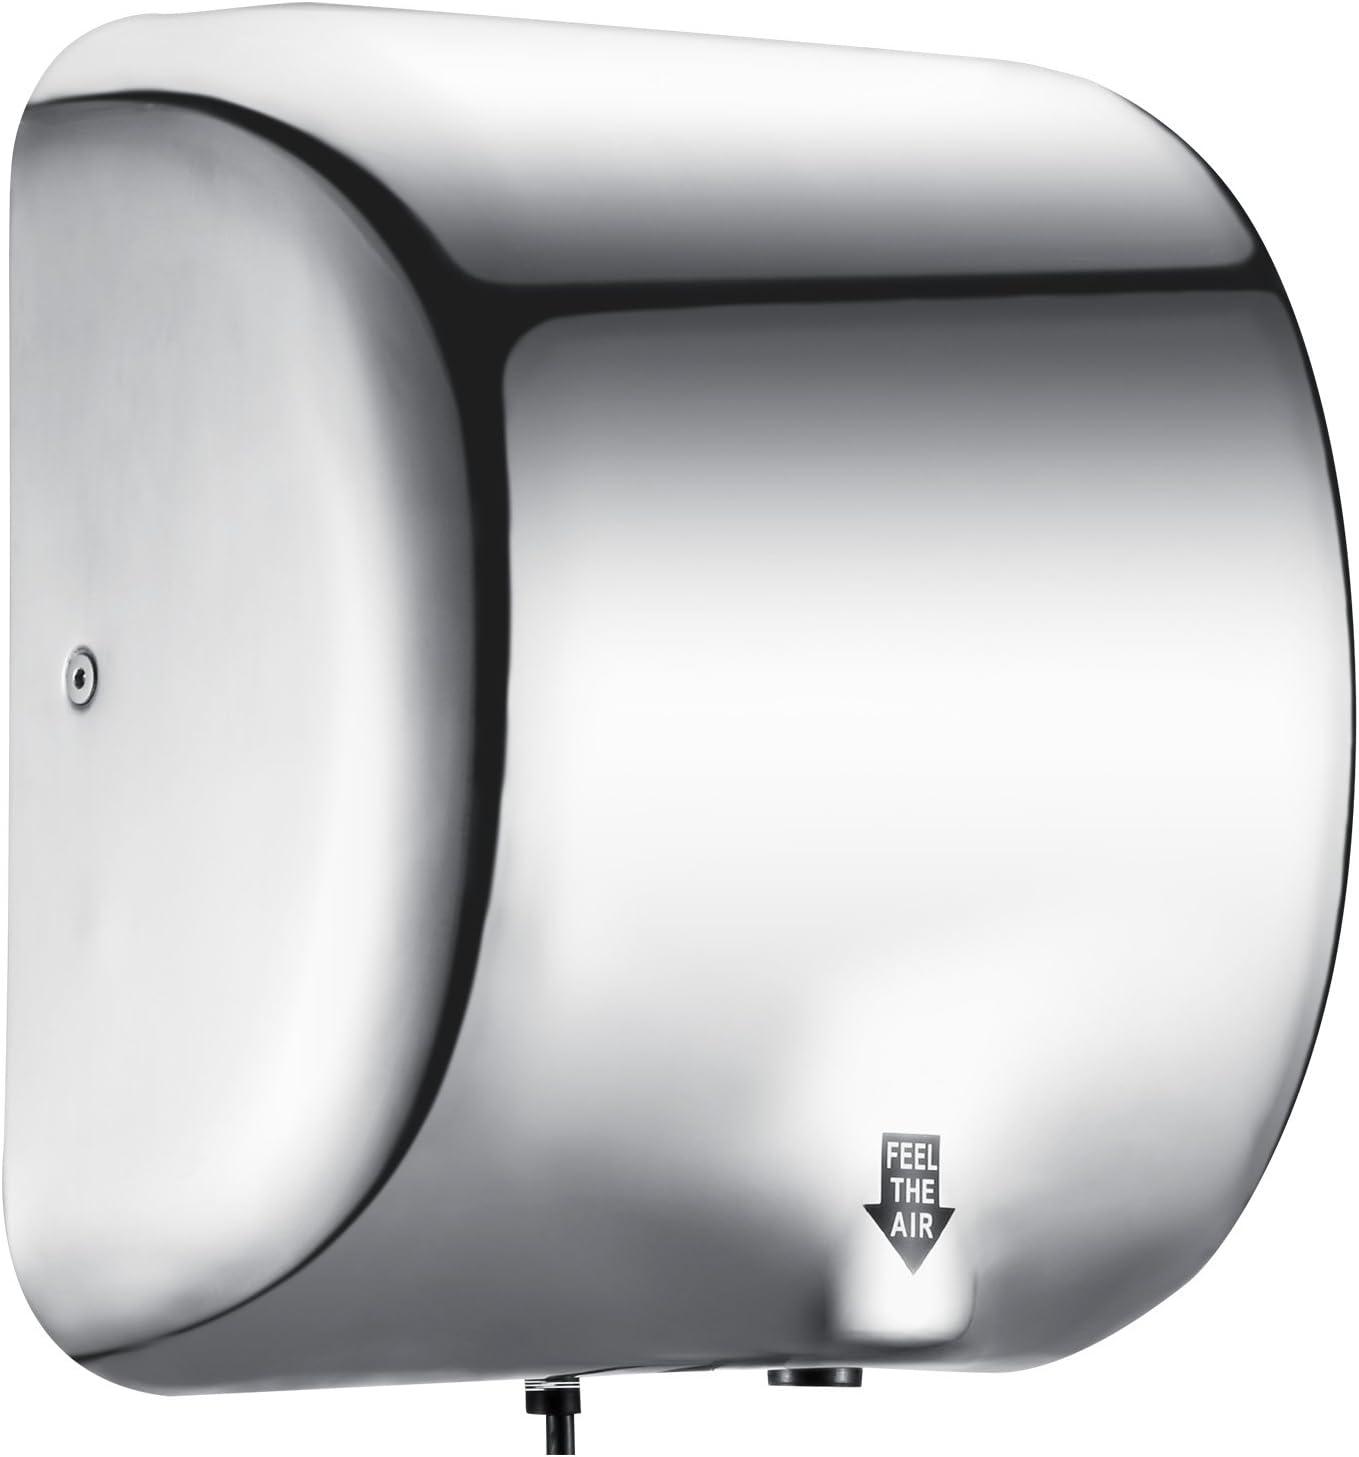 Elettrico Automatico Asciuga Mani Intelligente Mini induzione ad Alta velocit/à/Asciugatura Macchina con Fast Warm Air Generichaoge Bianco